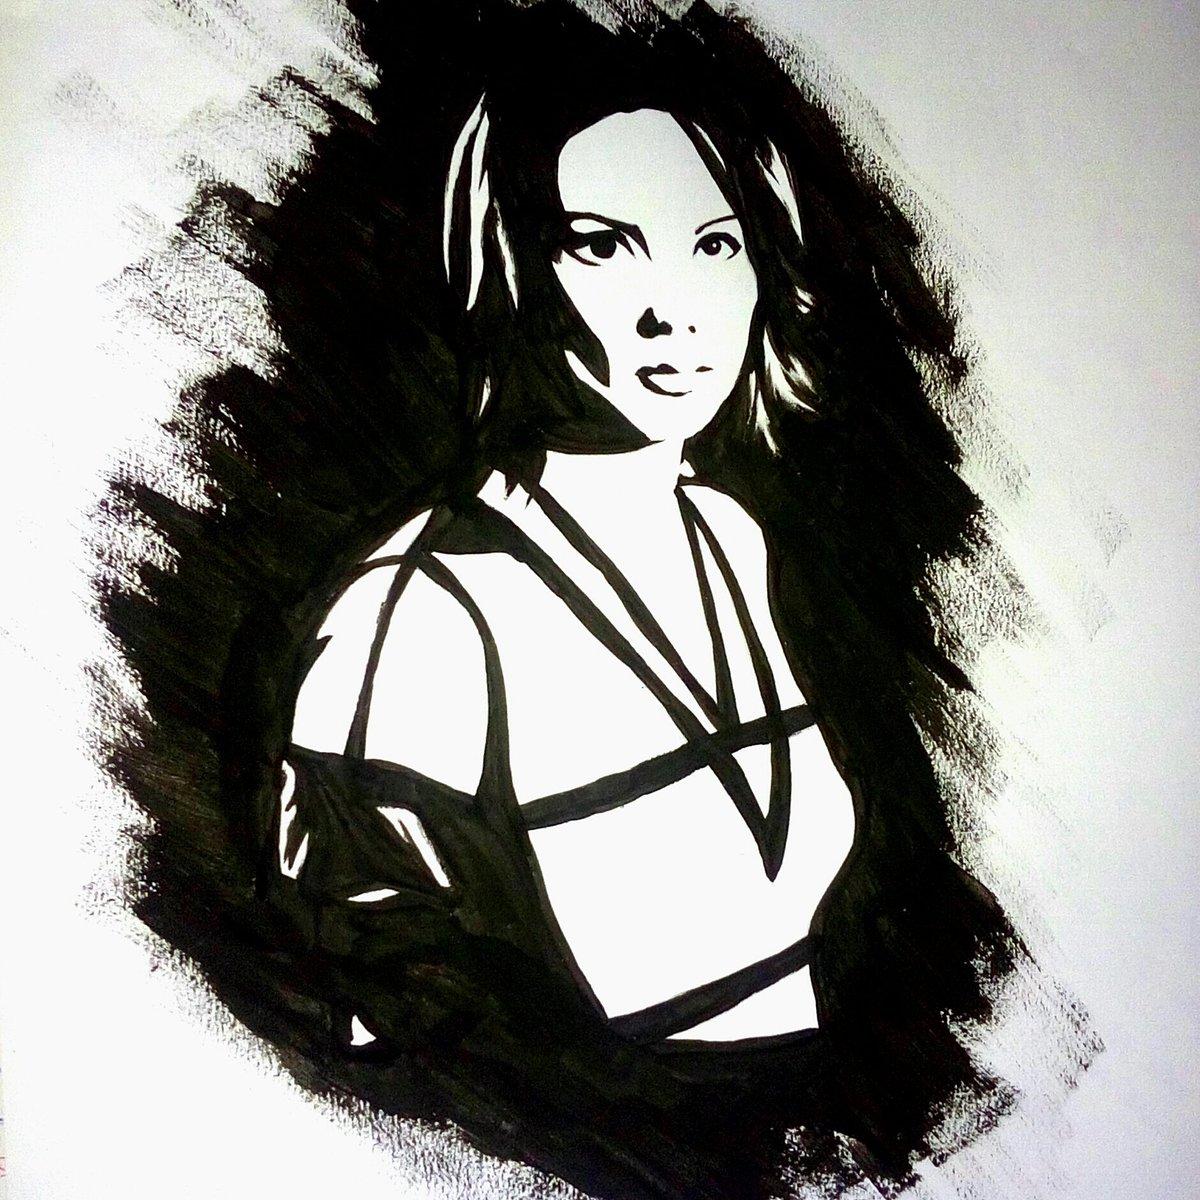 Veronica Rosazza Prin ha dipinto Lexa Doig nei panni di Rommie, in Gene roddenberry's Andromeda